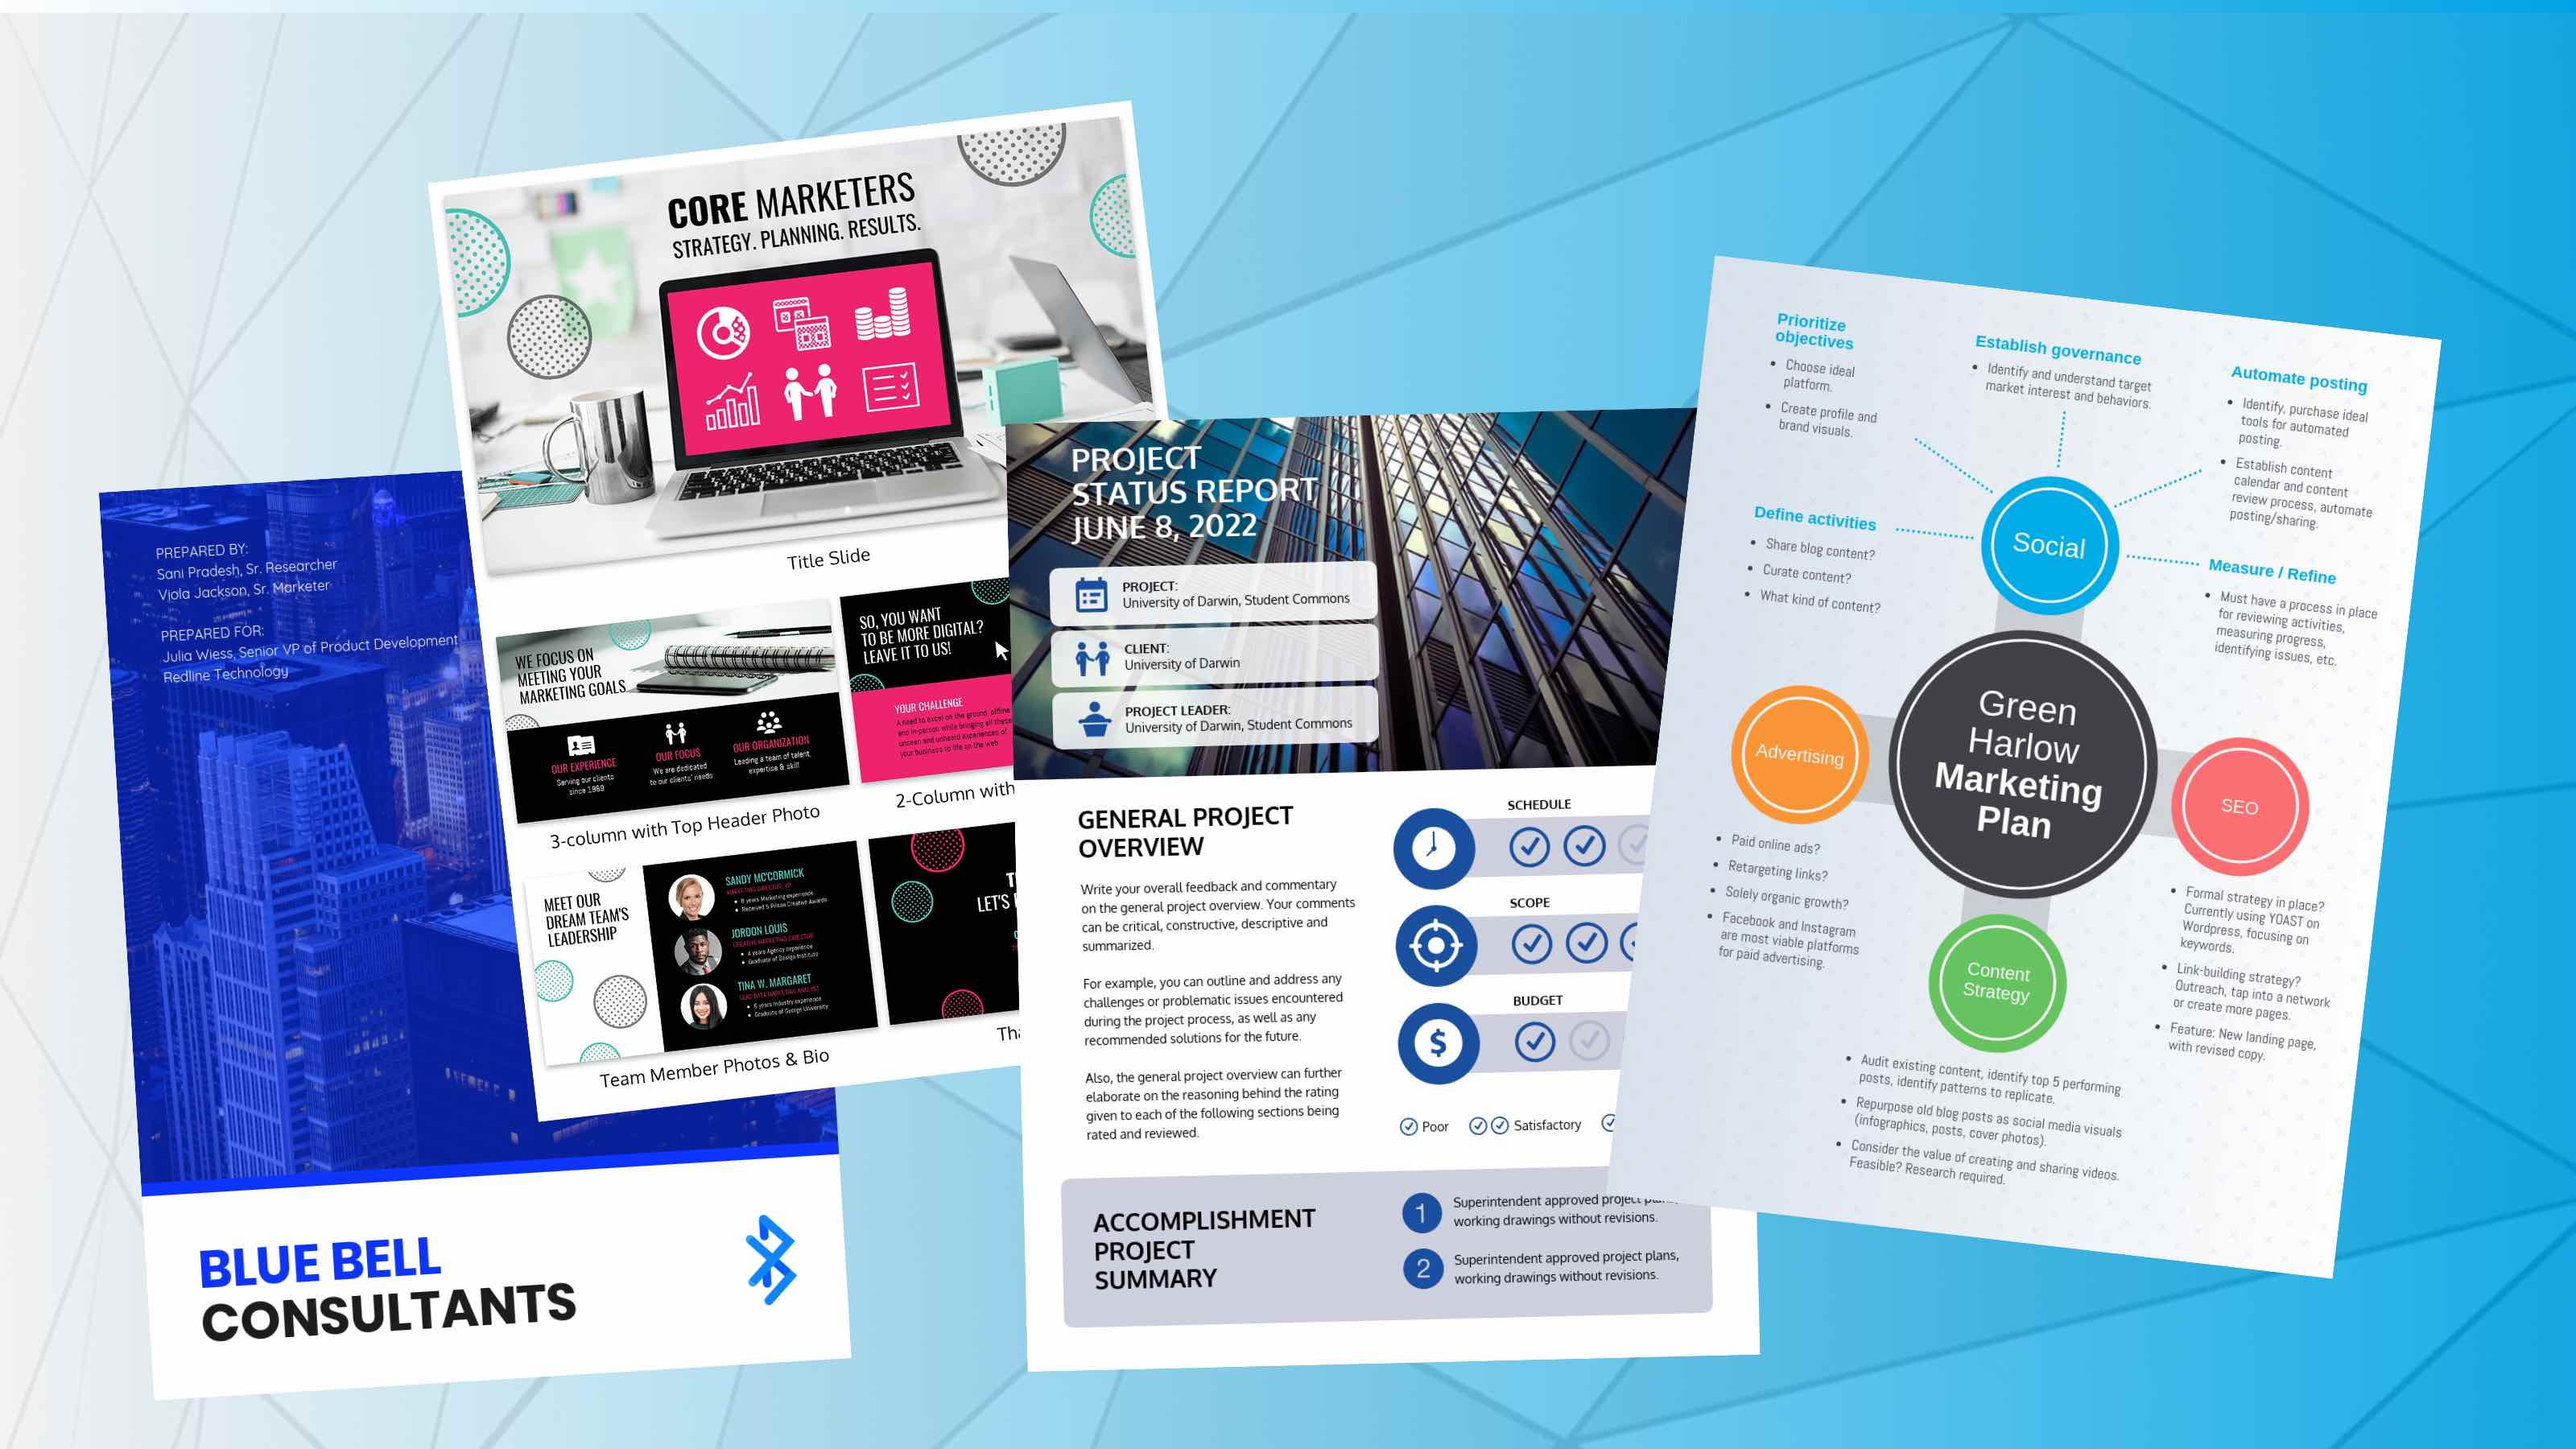 best marketing strategies blog link